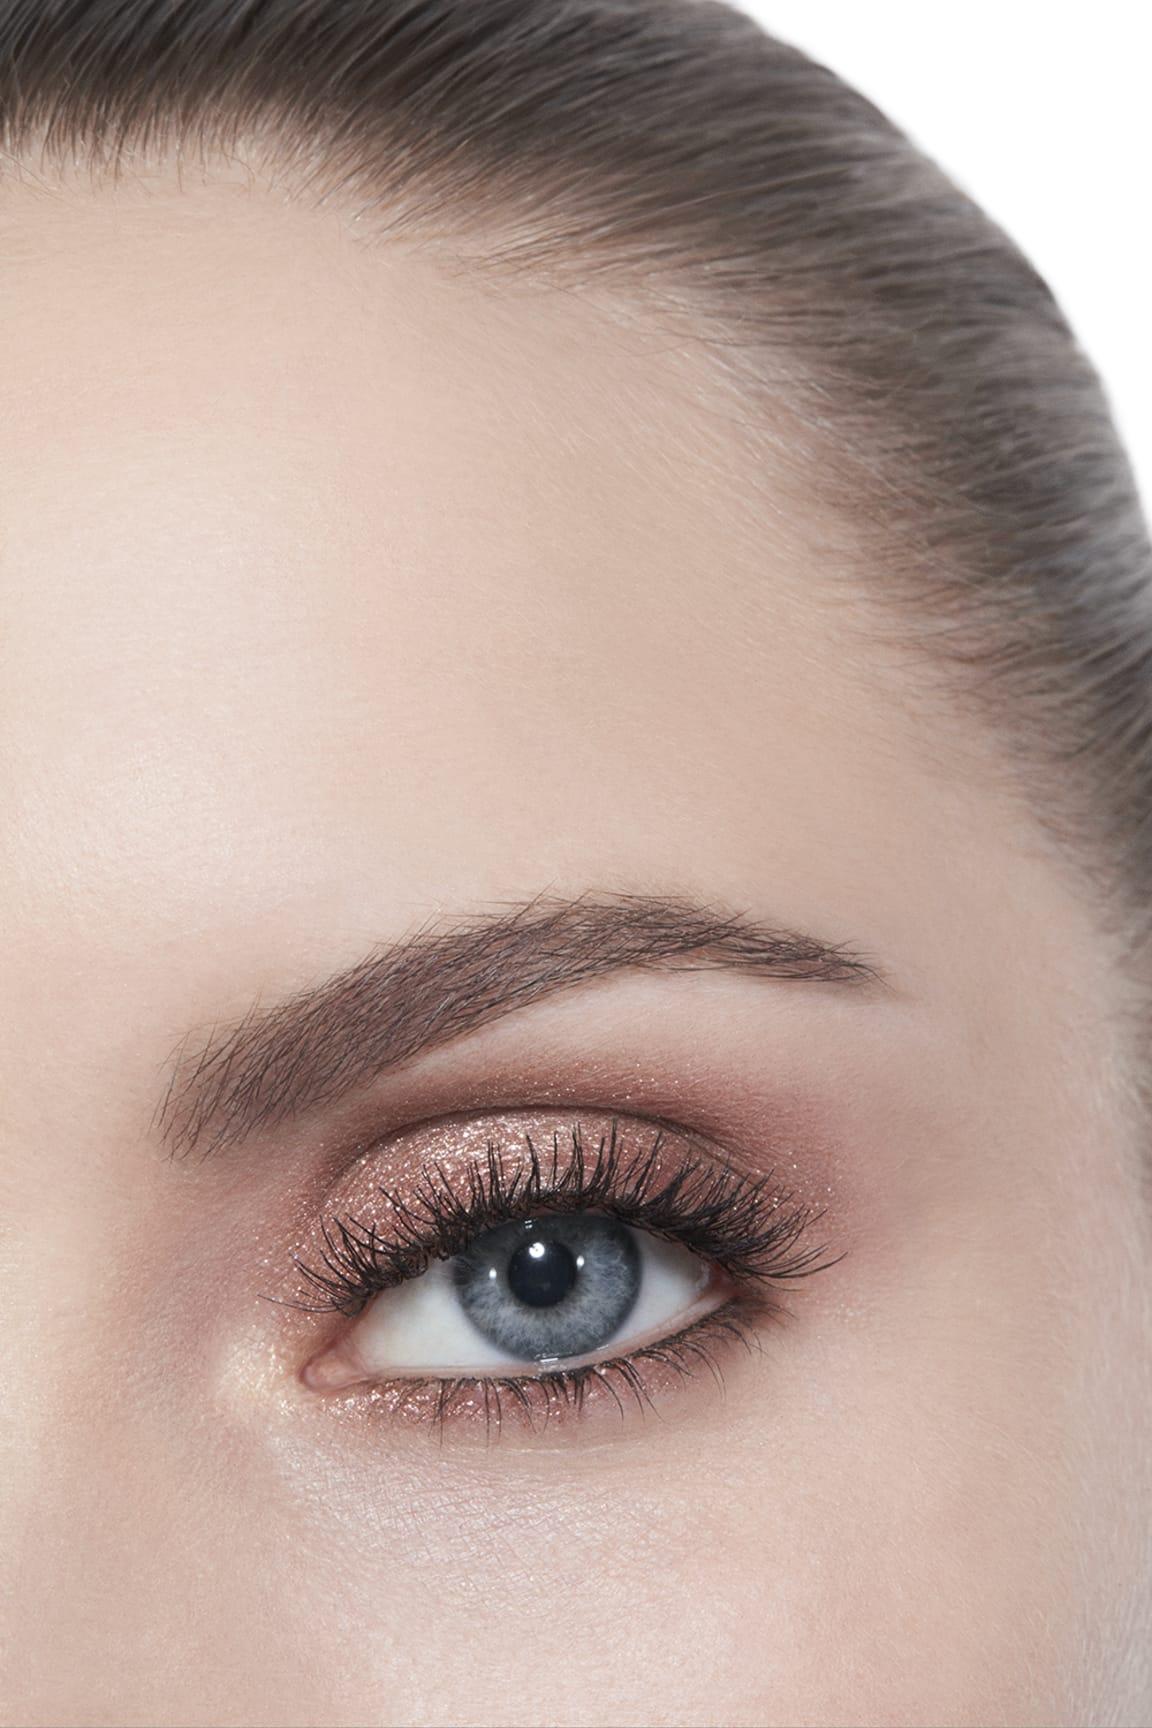 Application makeup visual 2 - ILLUSION D'OMBRE 97 - NEW MOON